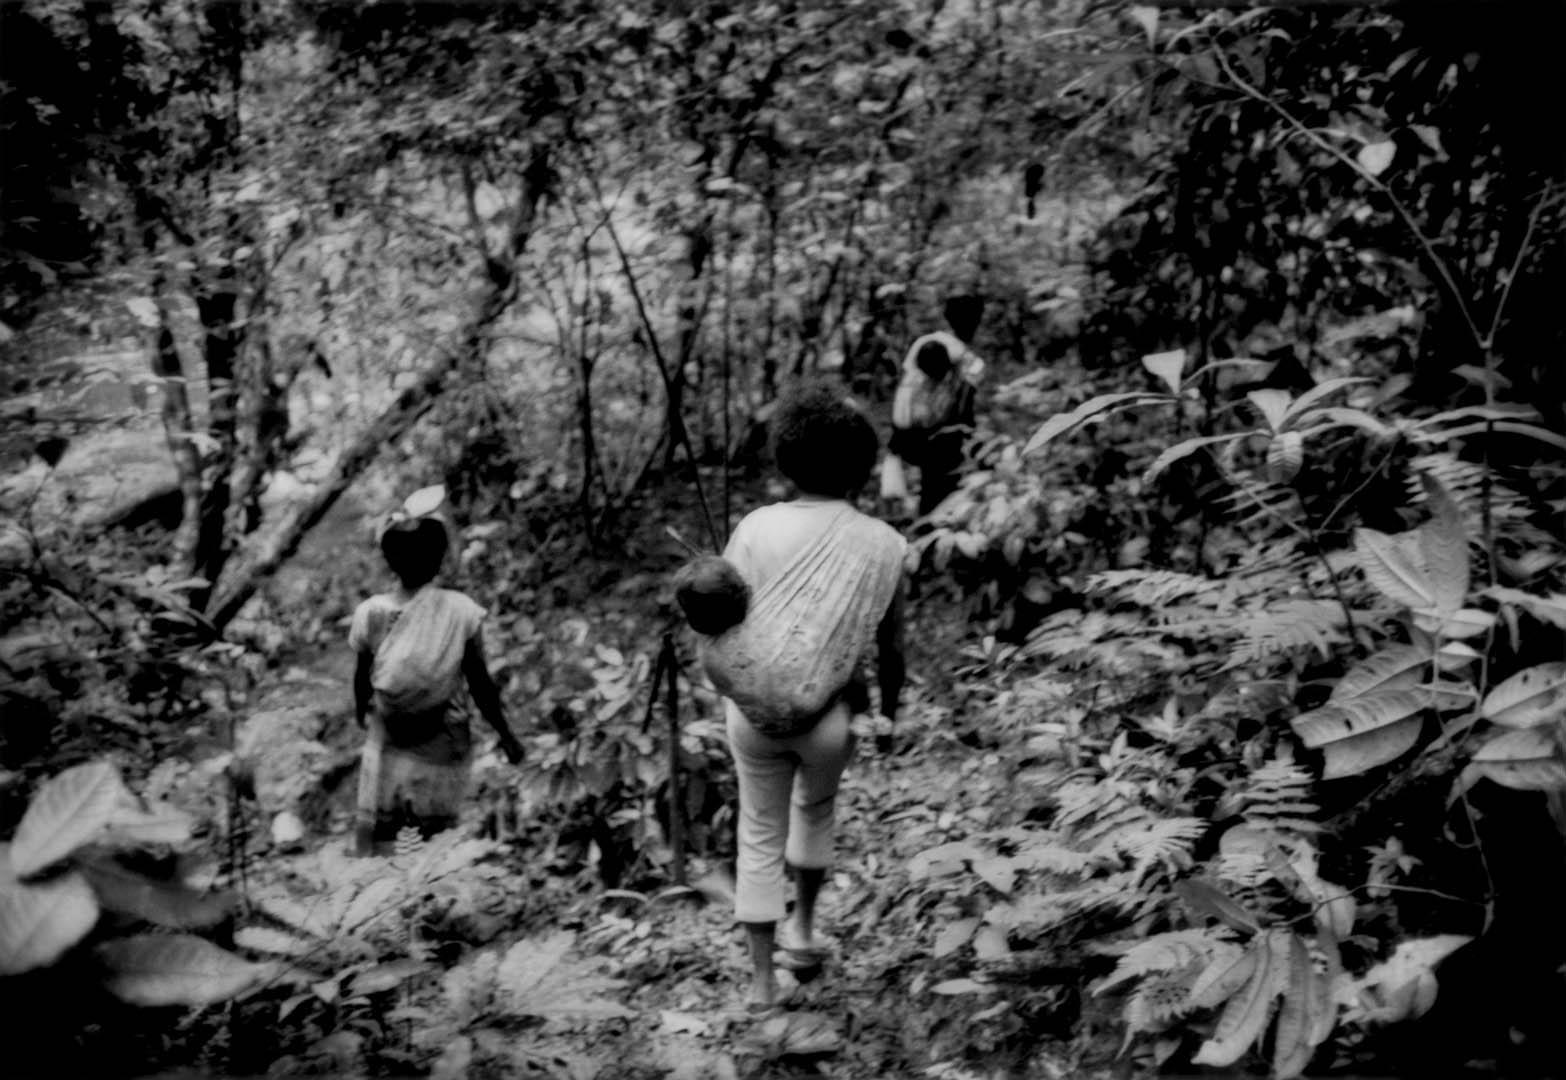 Batek People: The Little People: Equatorial